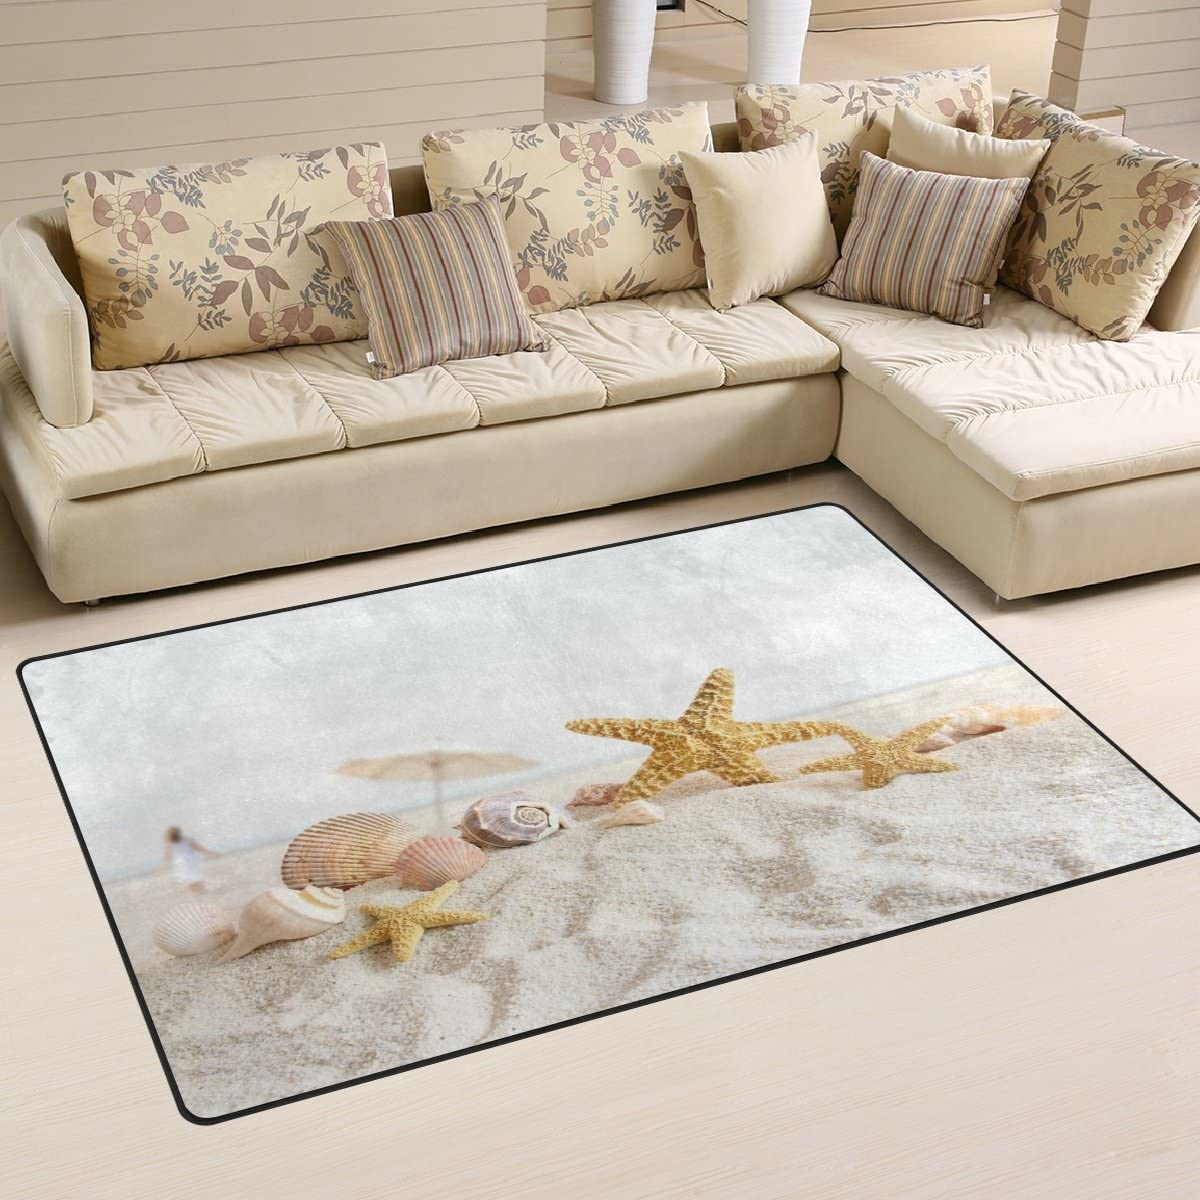 WOZO Starfish Seashells Sea Beach Area Rug Rugs Non-Slip Floor Mat Doormats Living Dining Room Bedroom Dorm 60 x 39 inches inches Home Decor